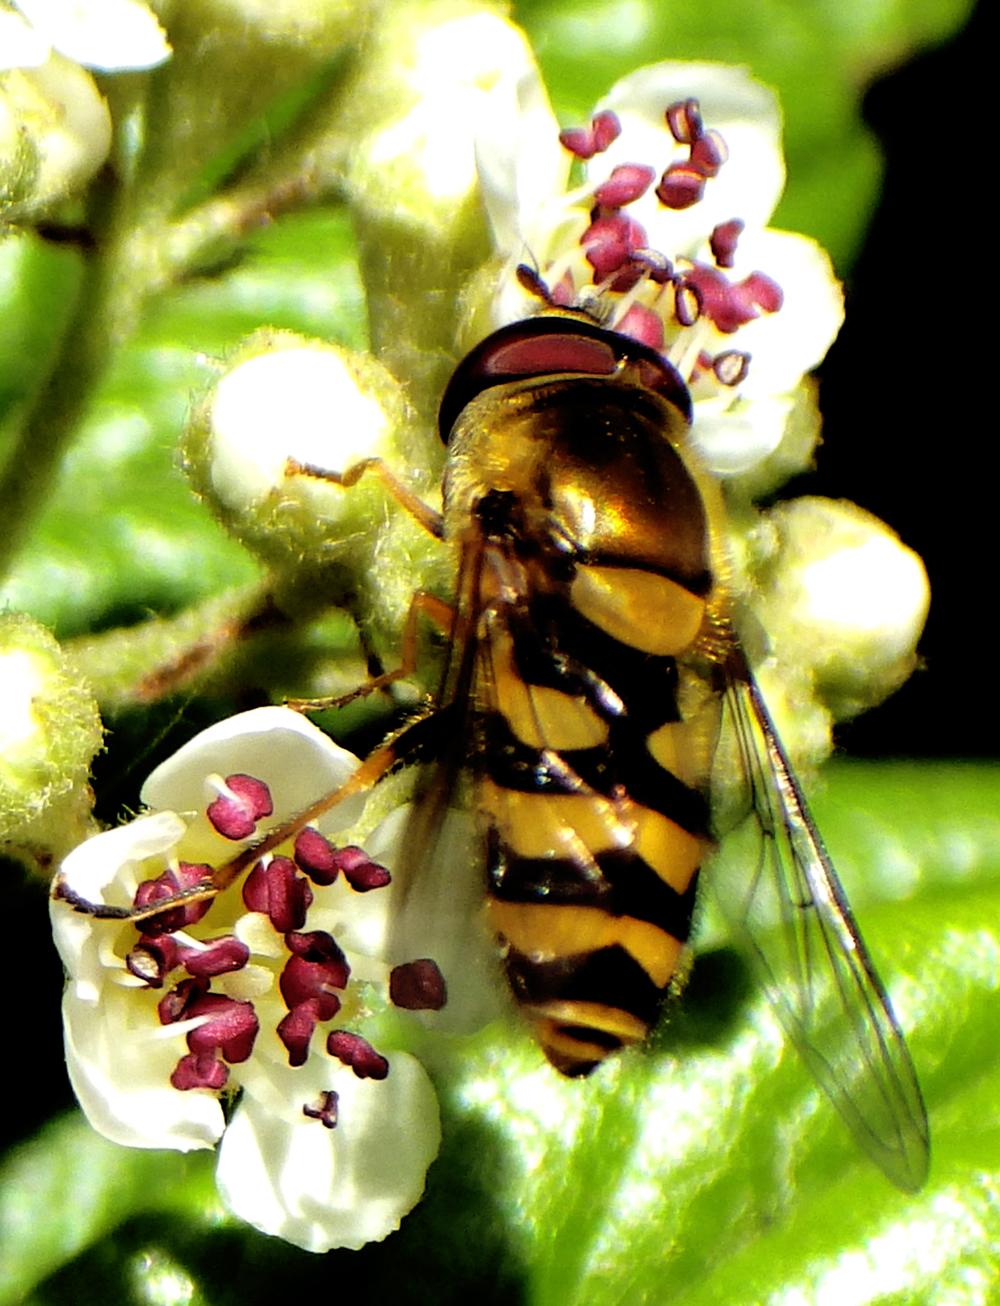 Bijen-bee-natuur-nature-Karin Waldner-fotografie-by-Gallery Communication in Art